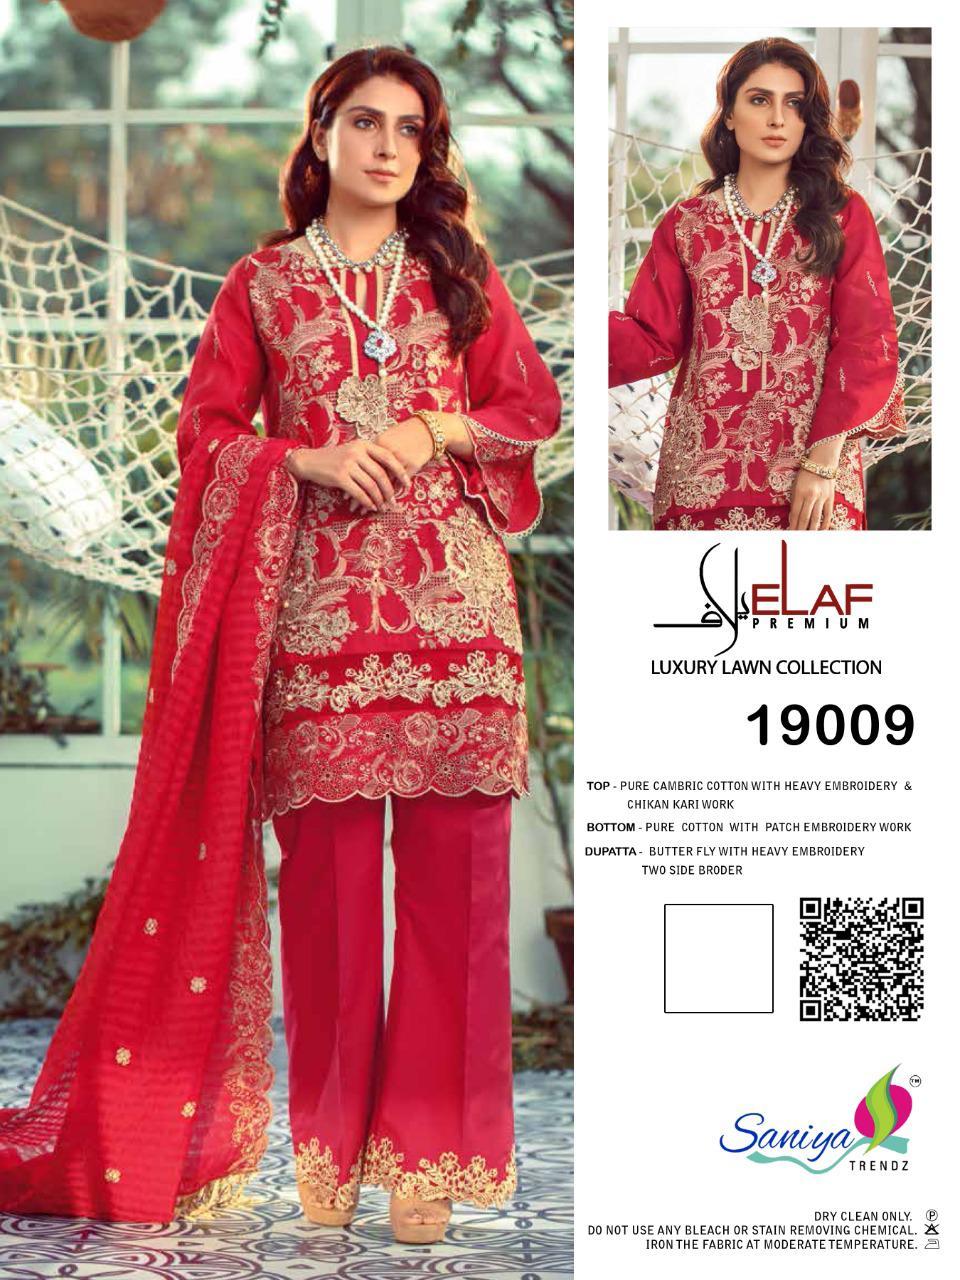 Saniya Trendz Elaf Vol 3 Series 19008-19010 Pure Cambric Cotton Suit